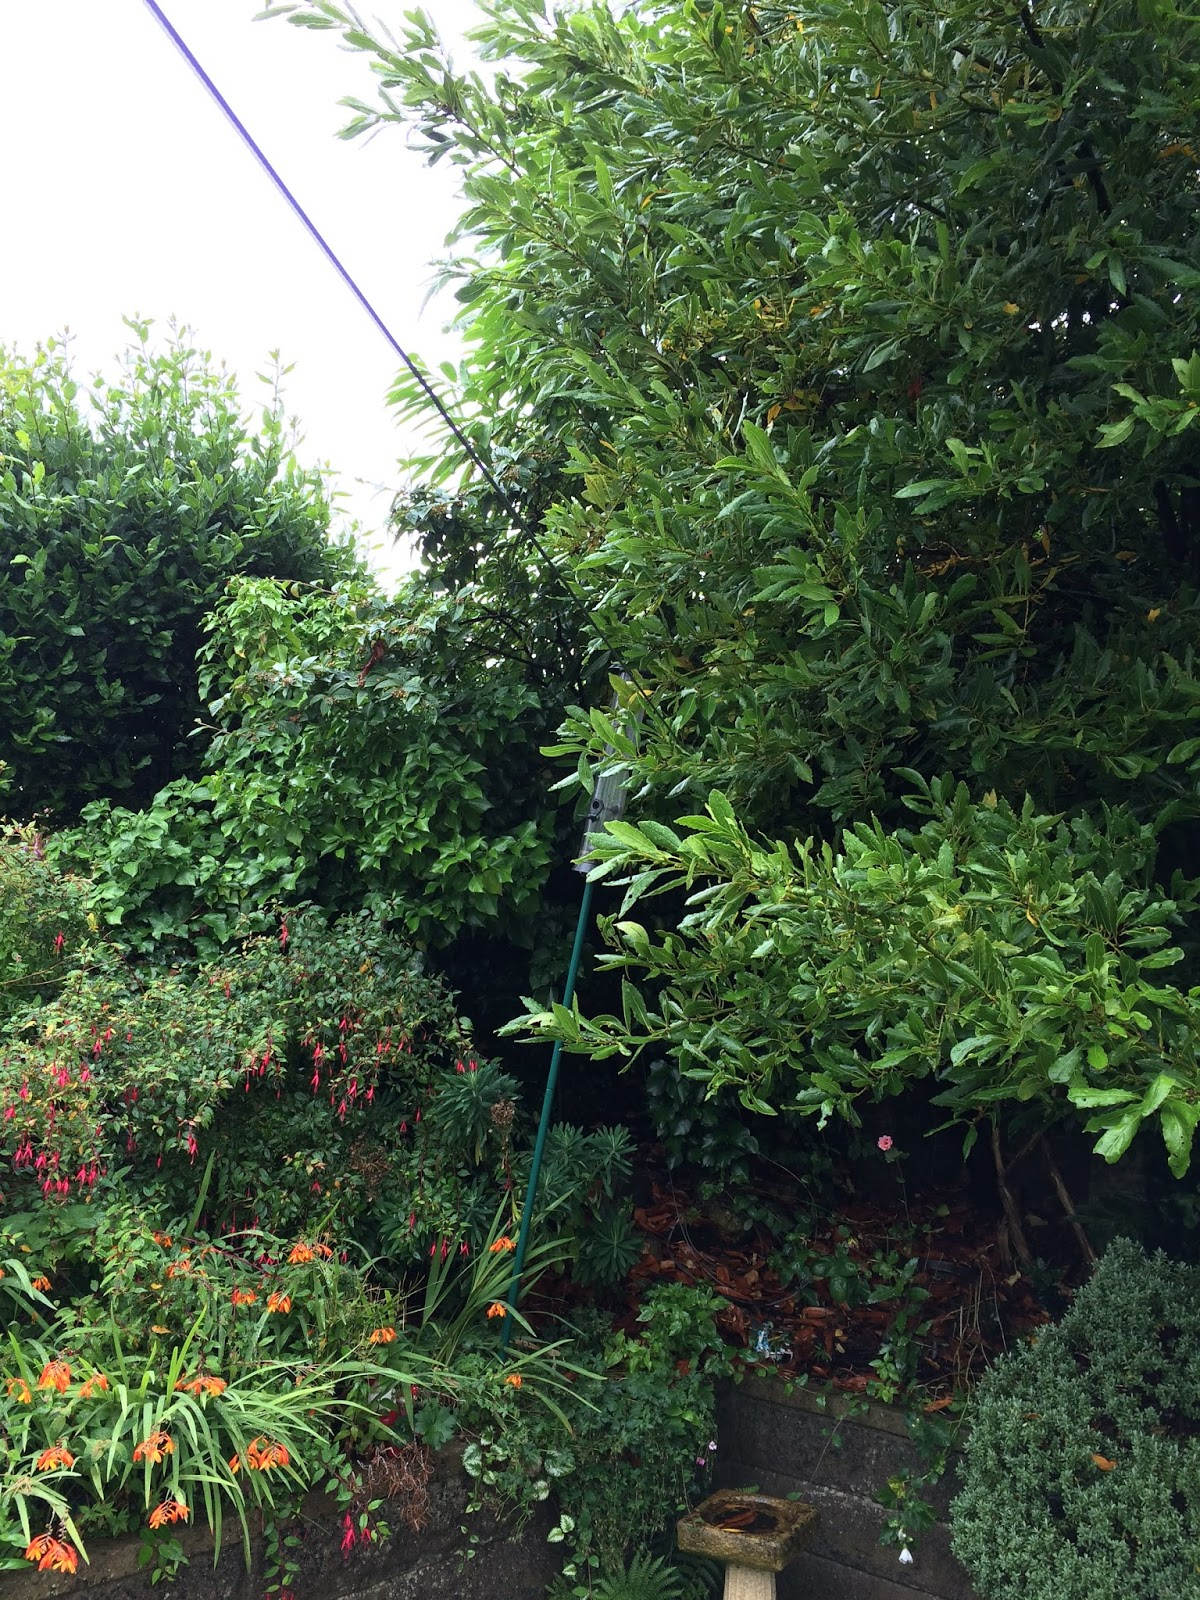 garden clean up - the corner of the Hobbis family back garden